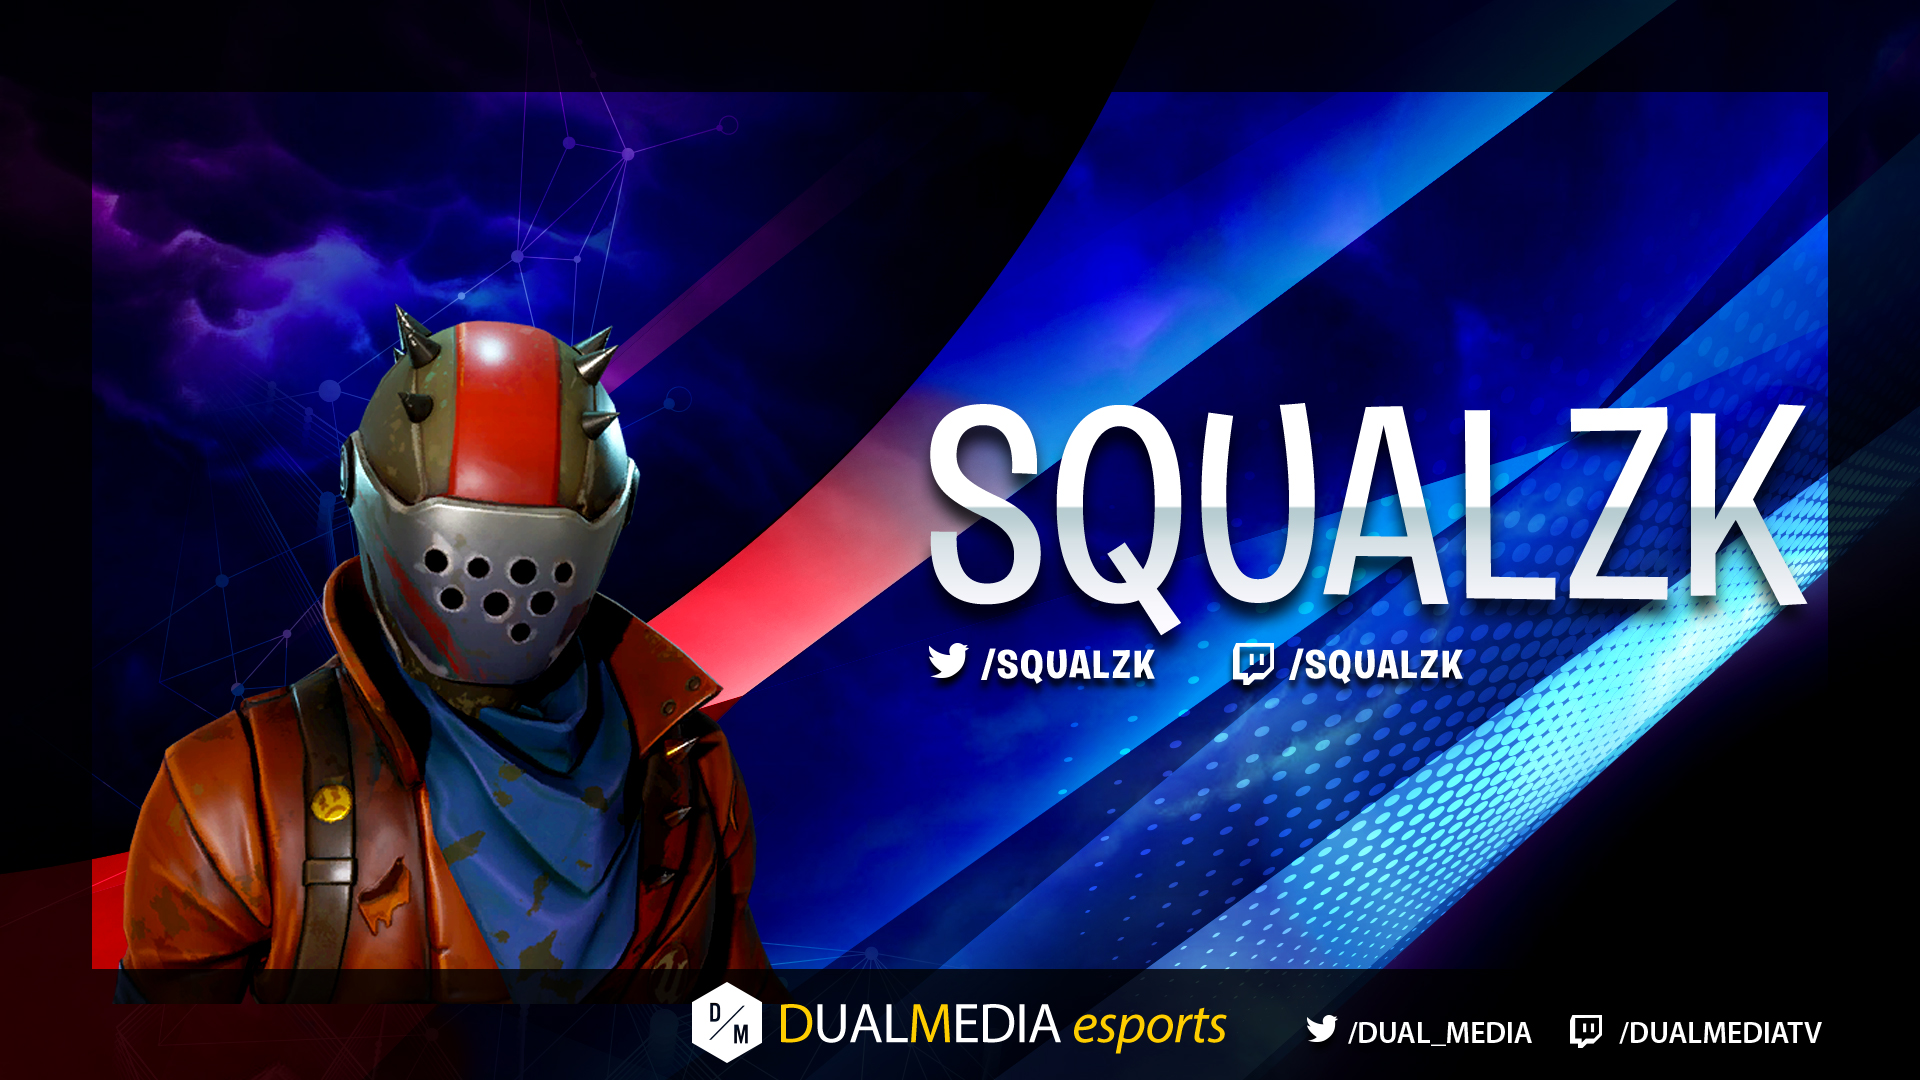 DualMedia Squalzk Joueur Fortnite